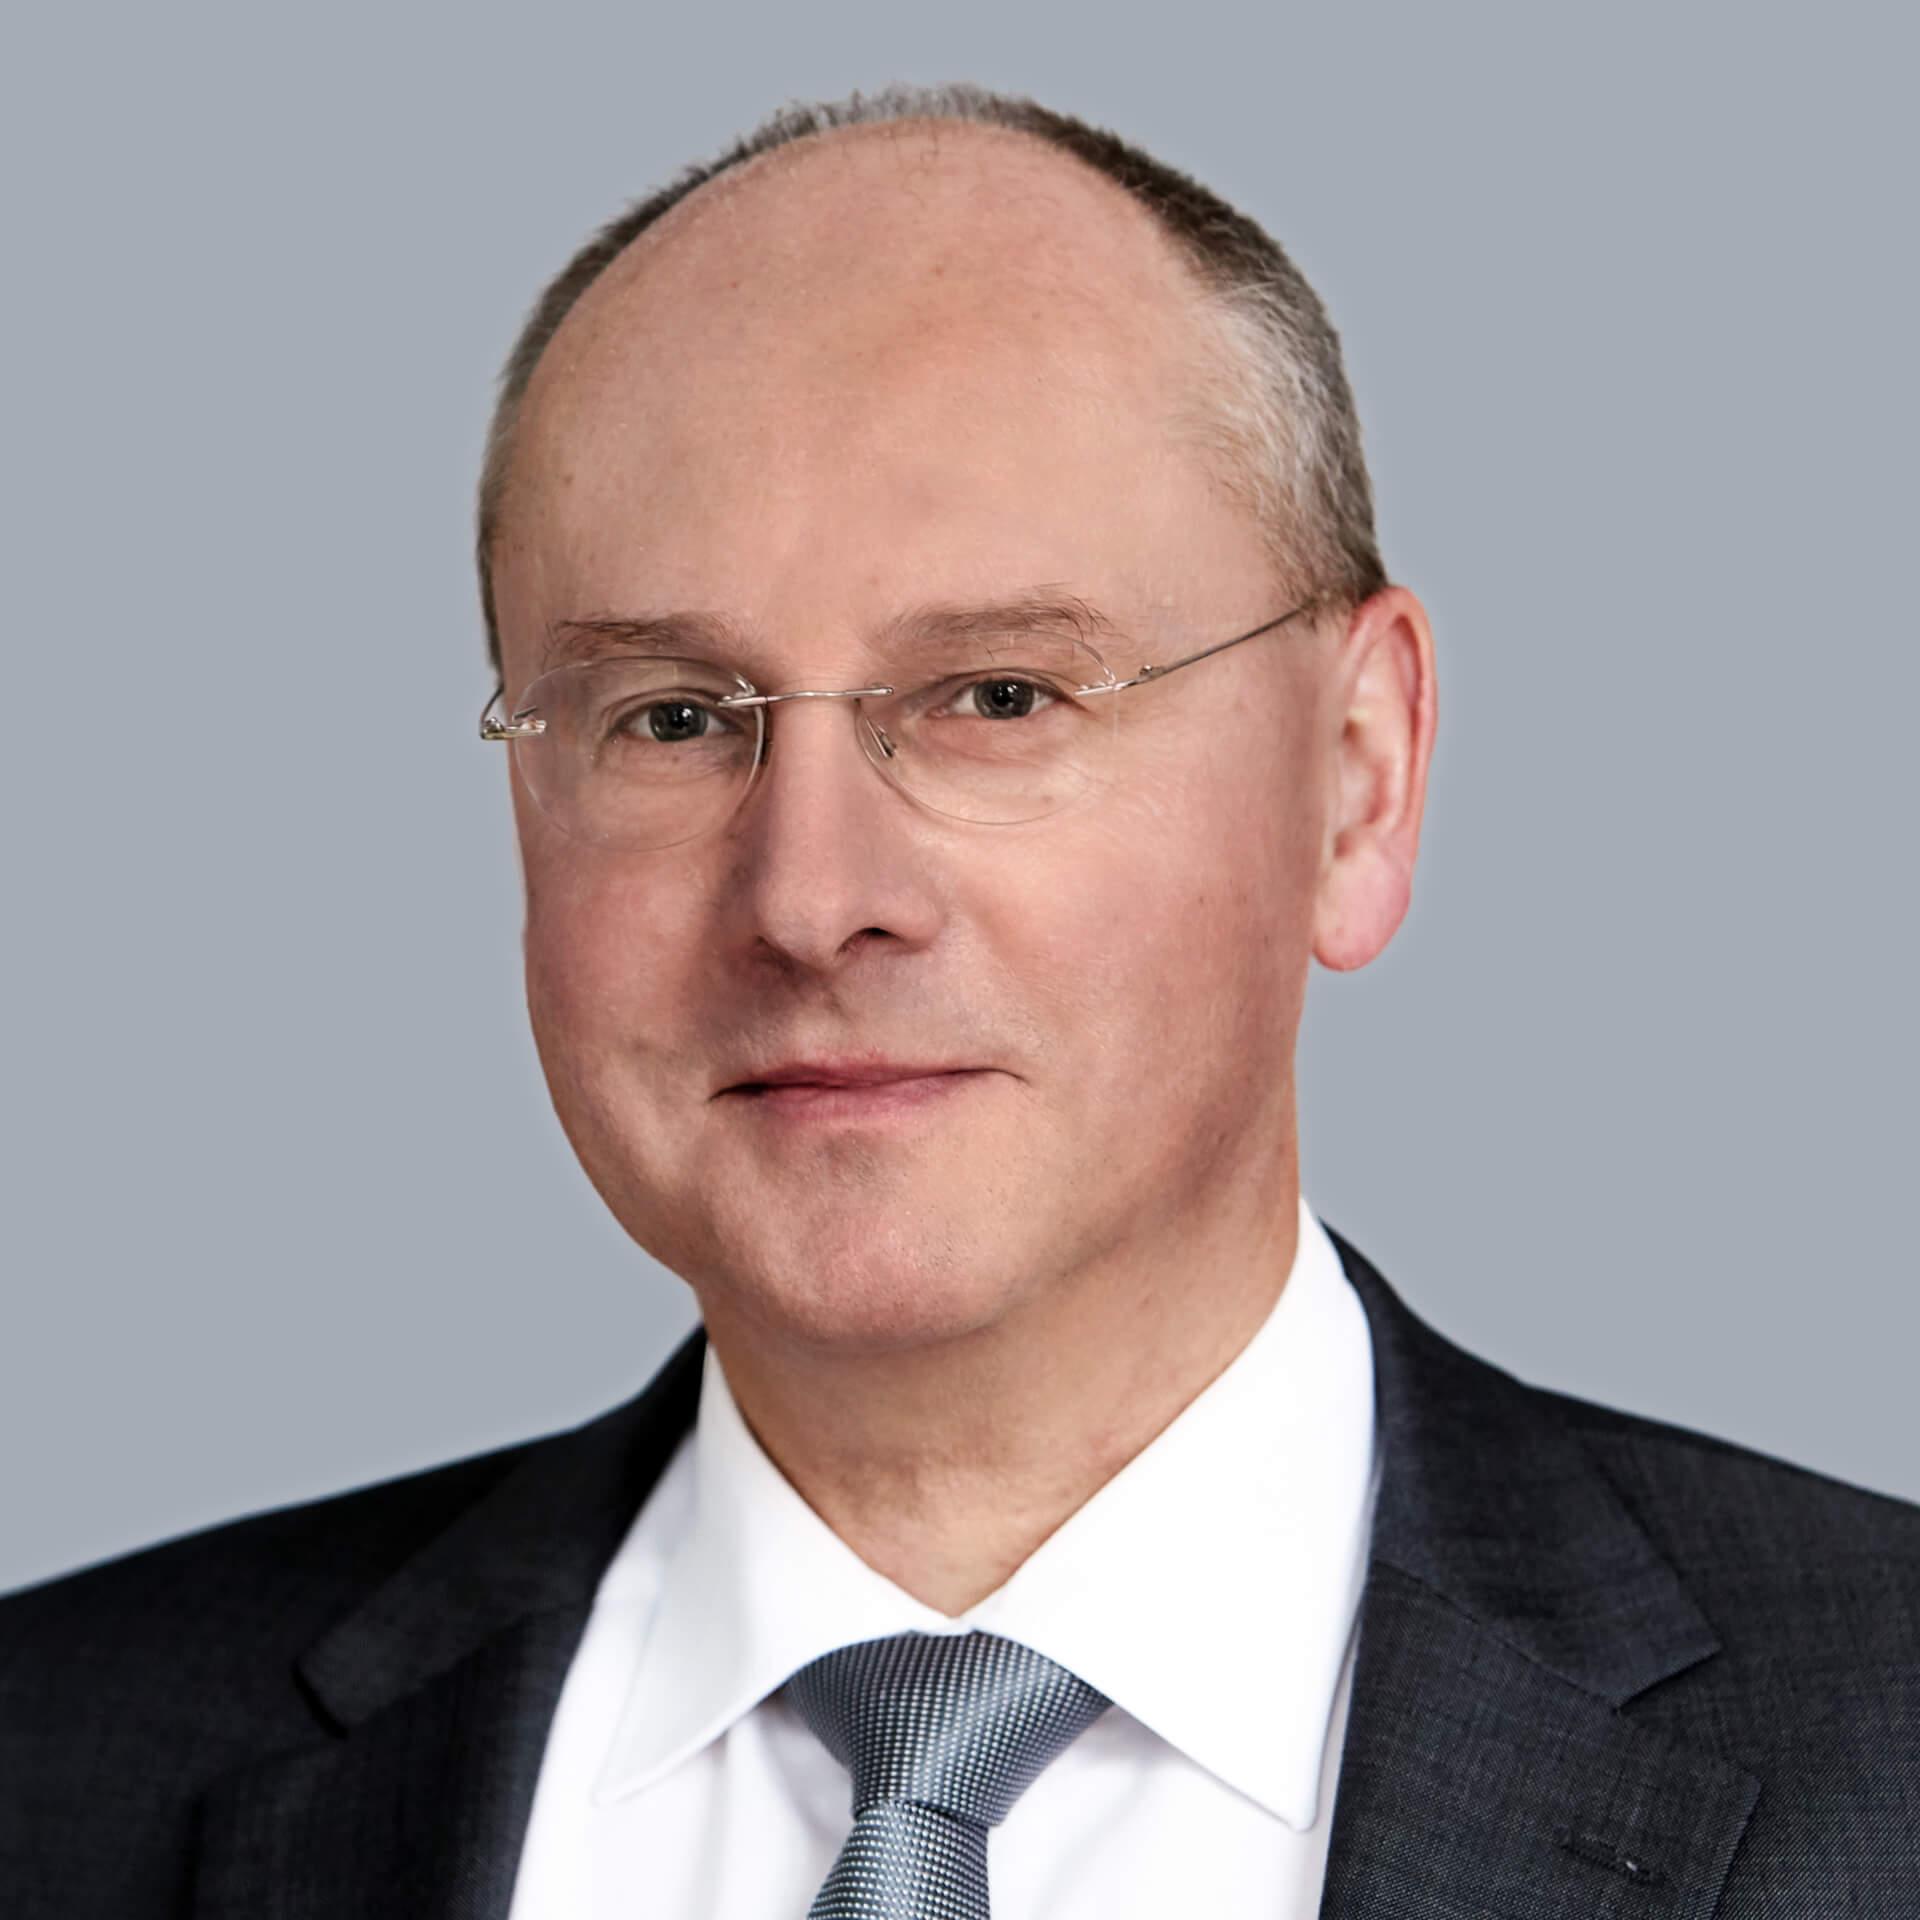 Gerald Klusmann